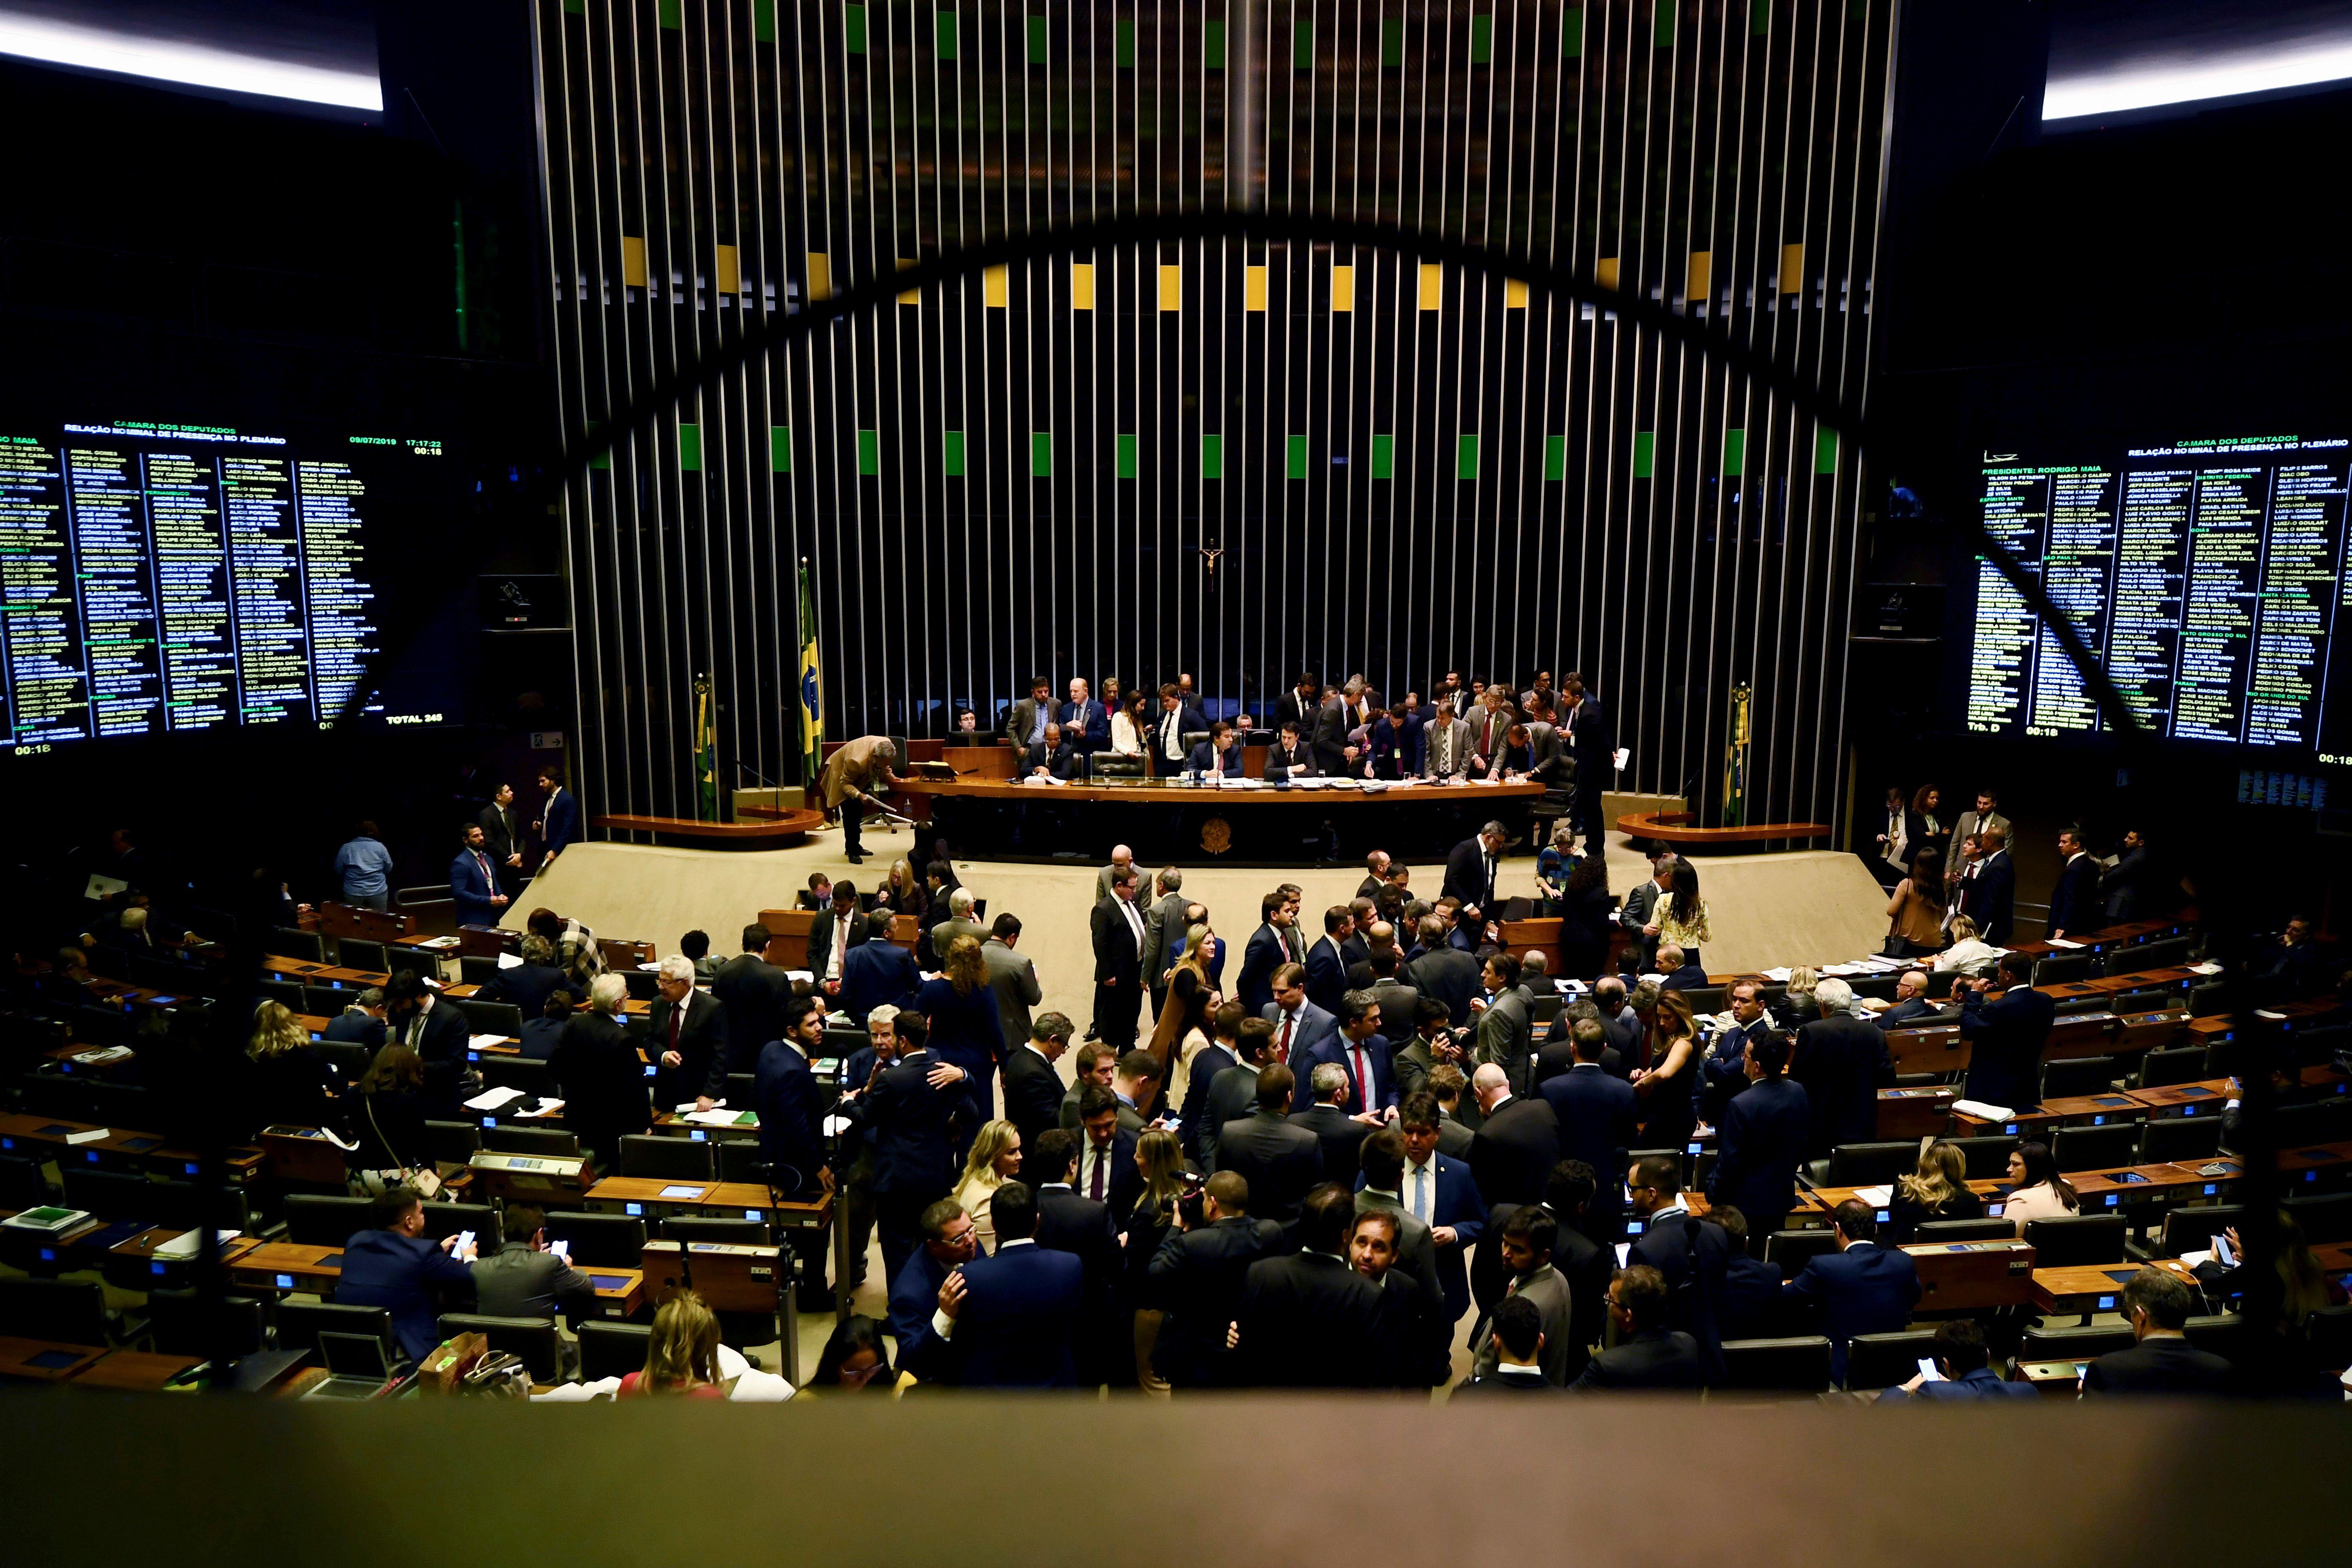 BRAZIL-POLITICS-PENSION-REFORM-VOTING